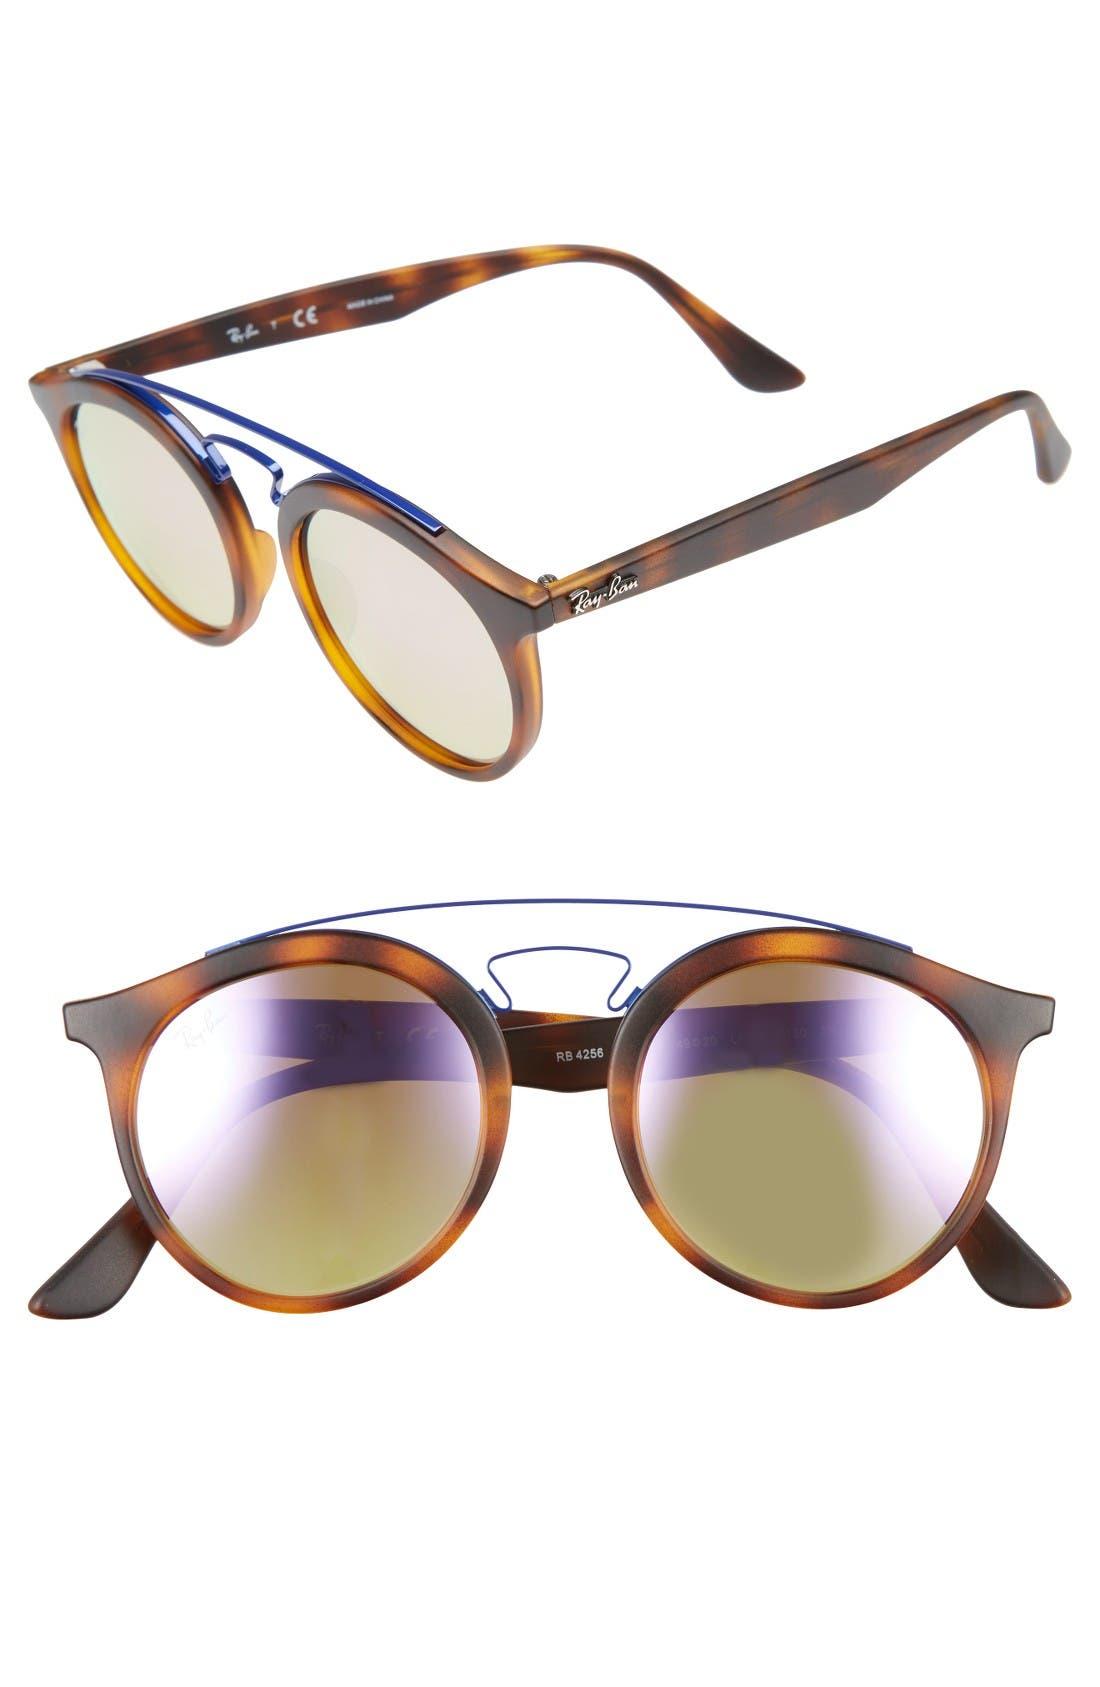 Ray-Ban Highstreet 49mm Gatsby Round Sunglasses